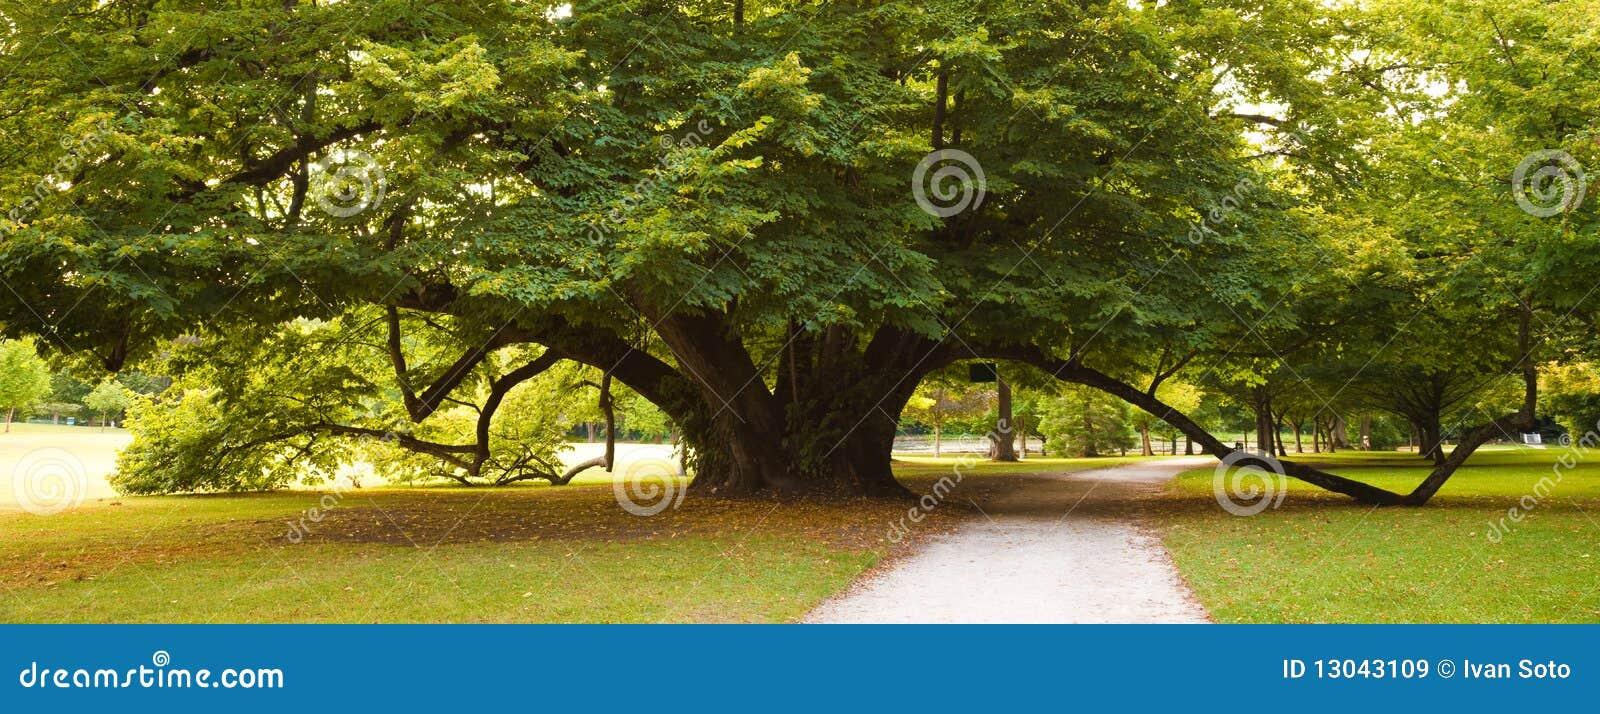 arbre de tilleul centenaire image stock image du arbre outdoors 13043109. Black Bedroom Furniture Sets. Home Design Ideas